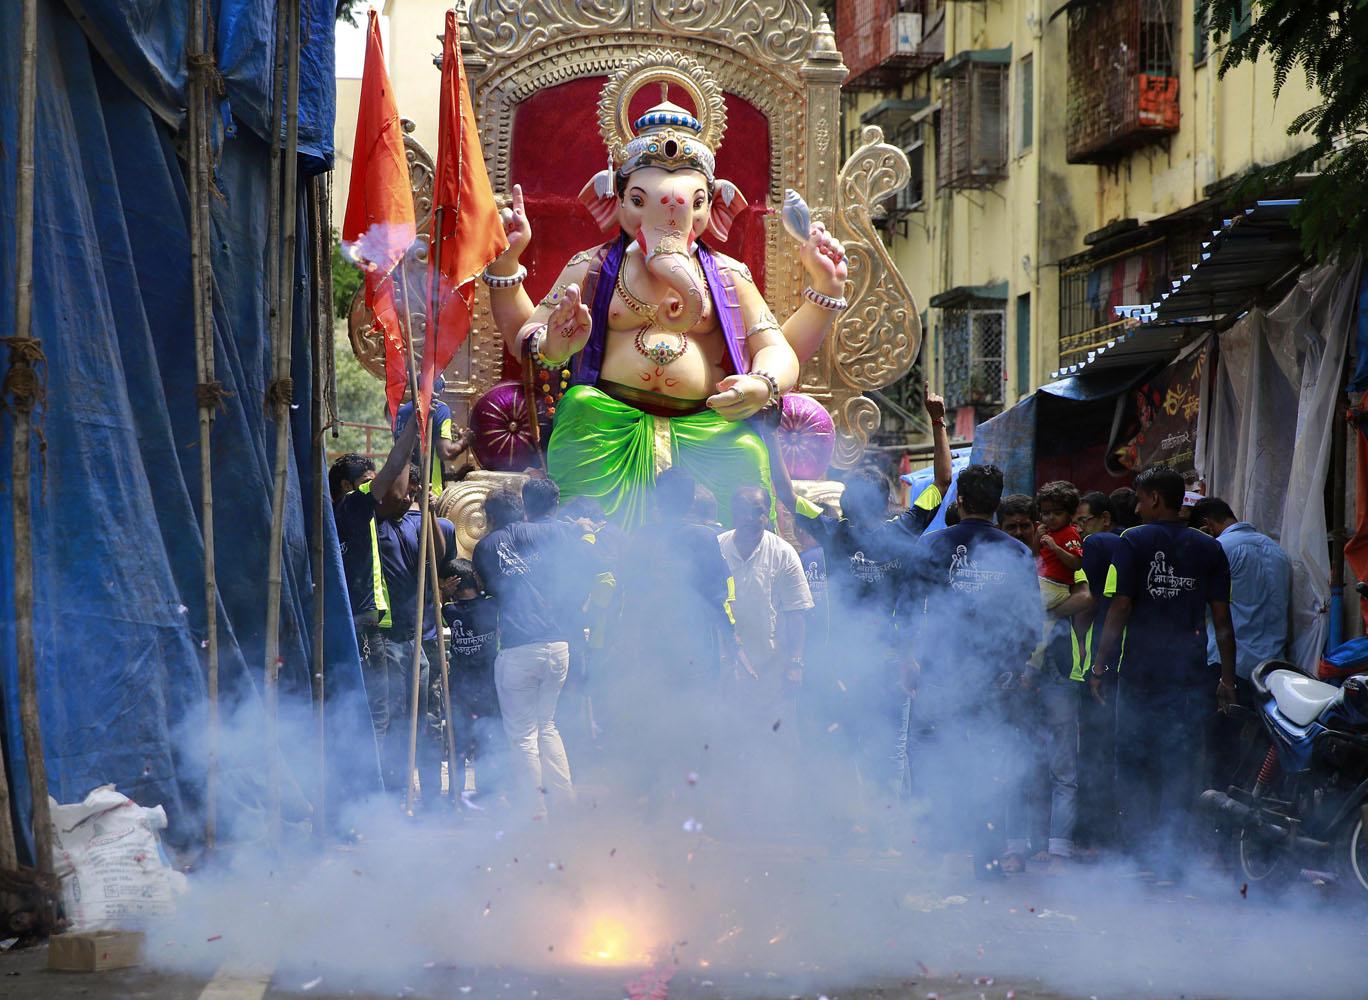 India's Ganesh Chaturthi festival